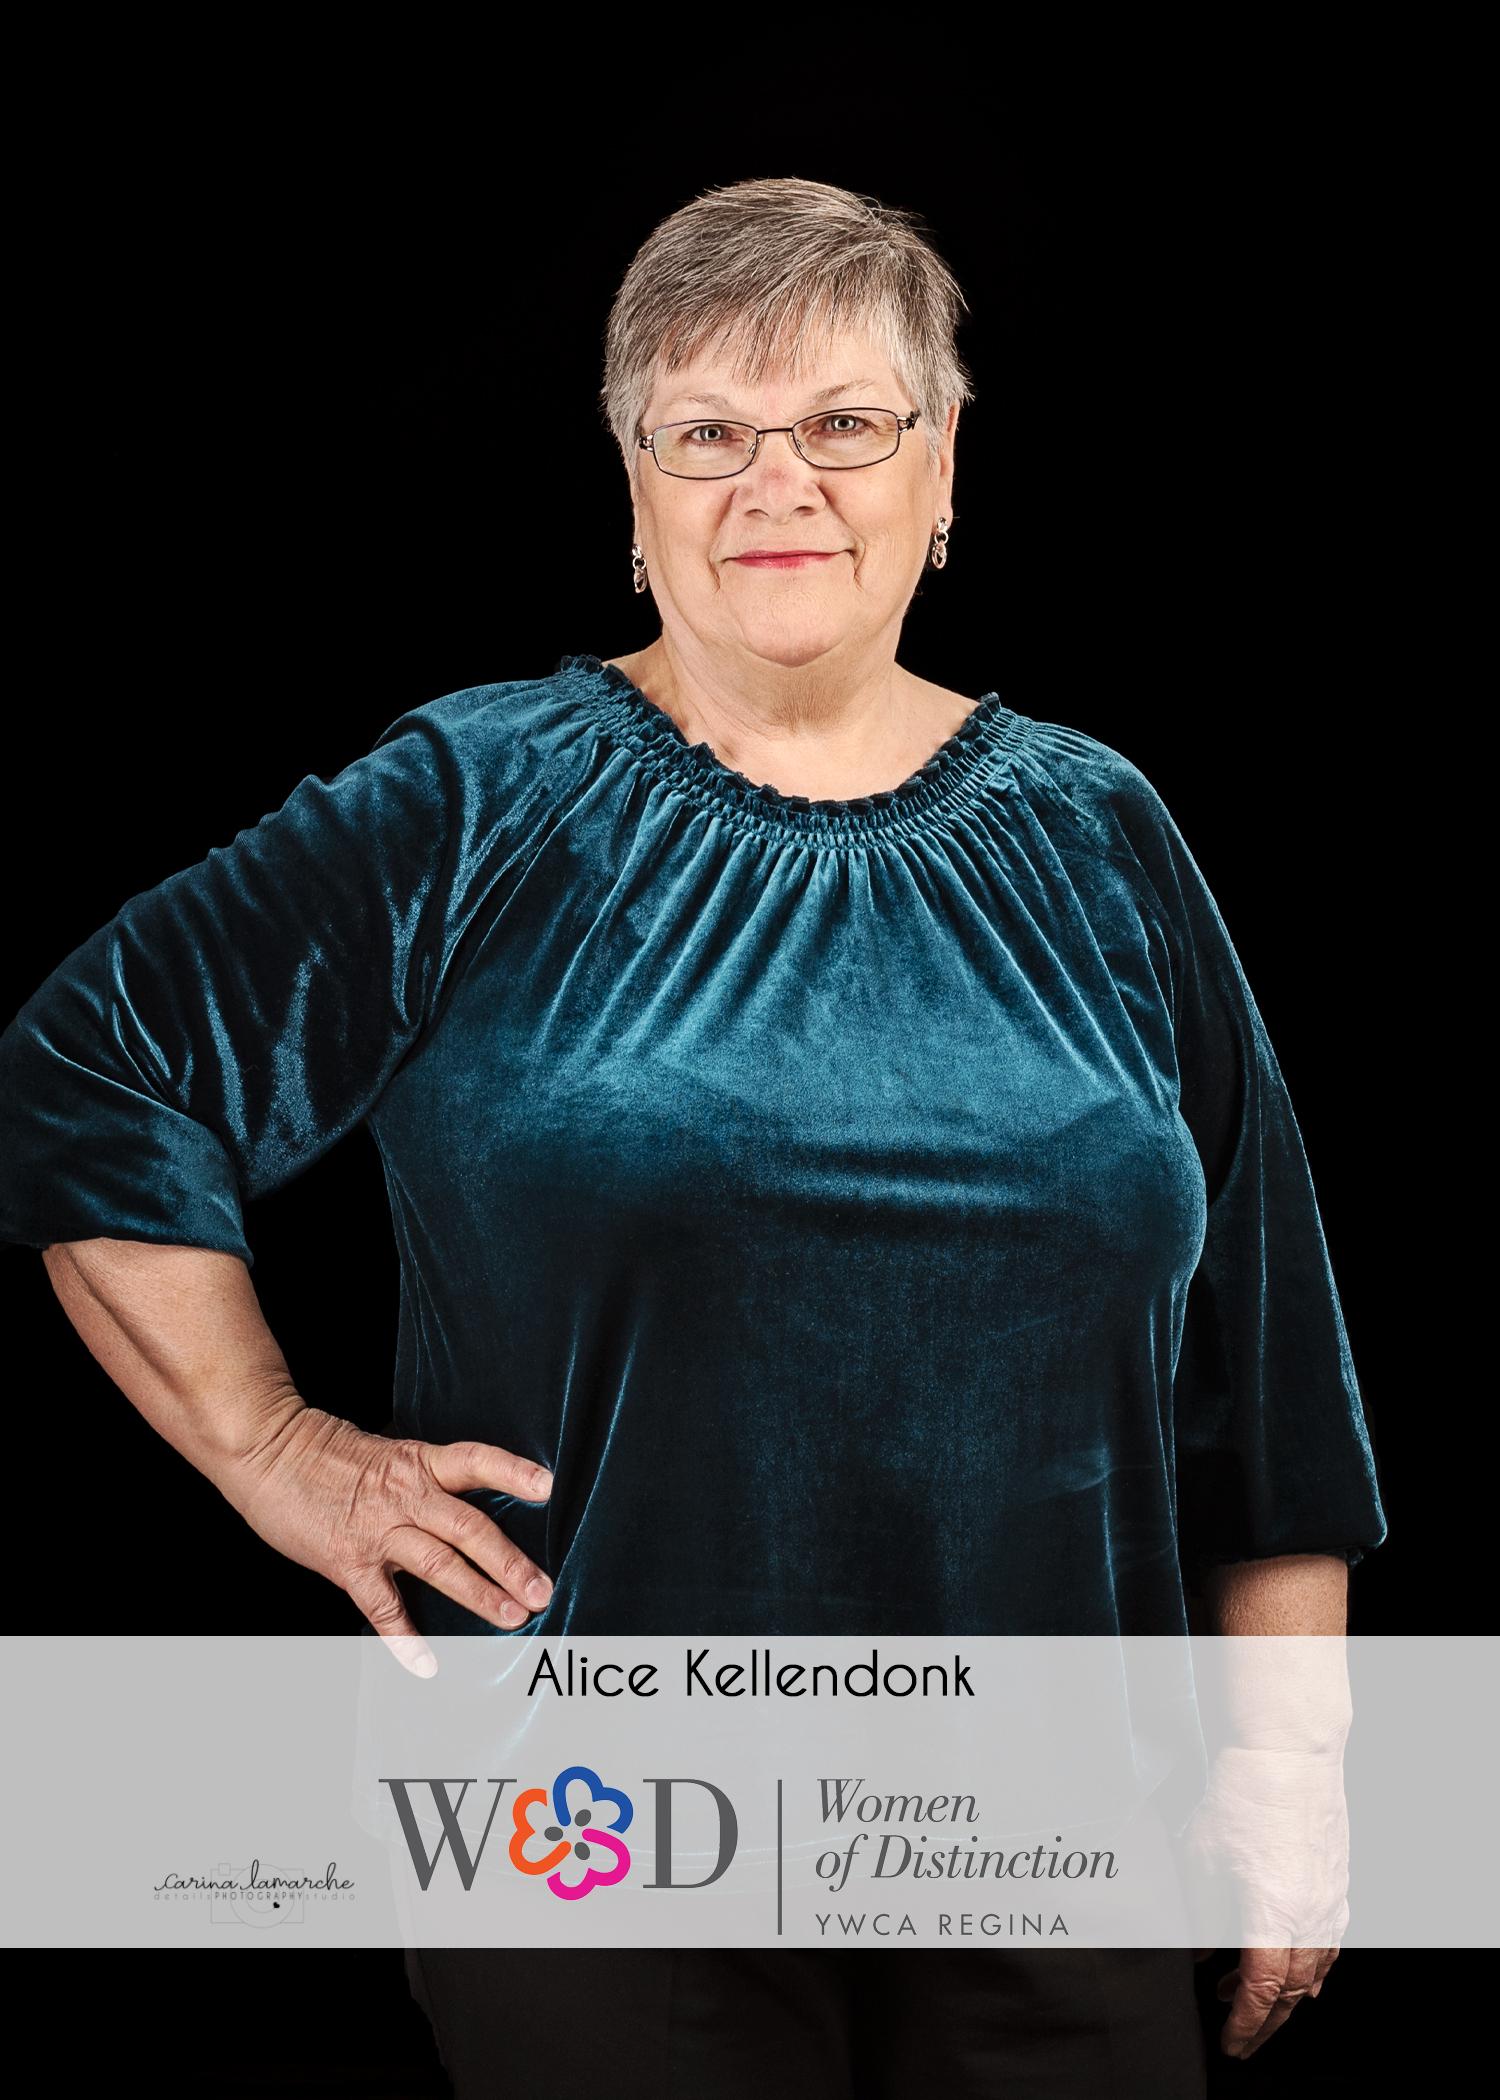 2019_053_Alice_Kellendonk_5x7.1.jpg